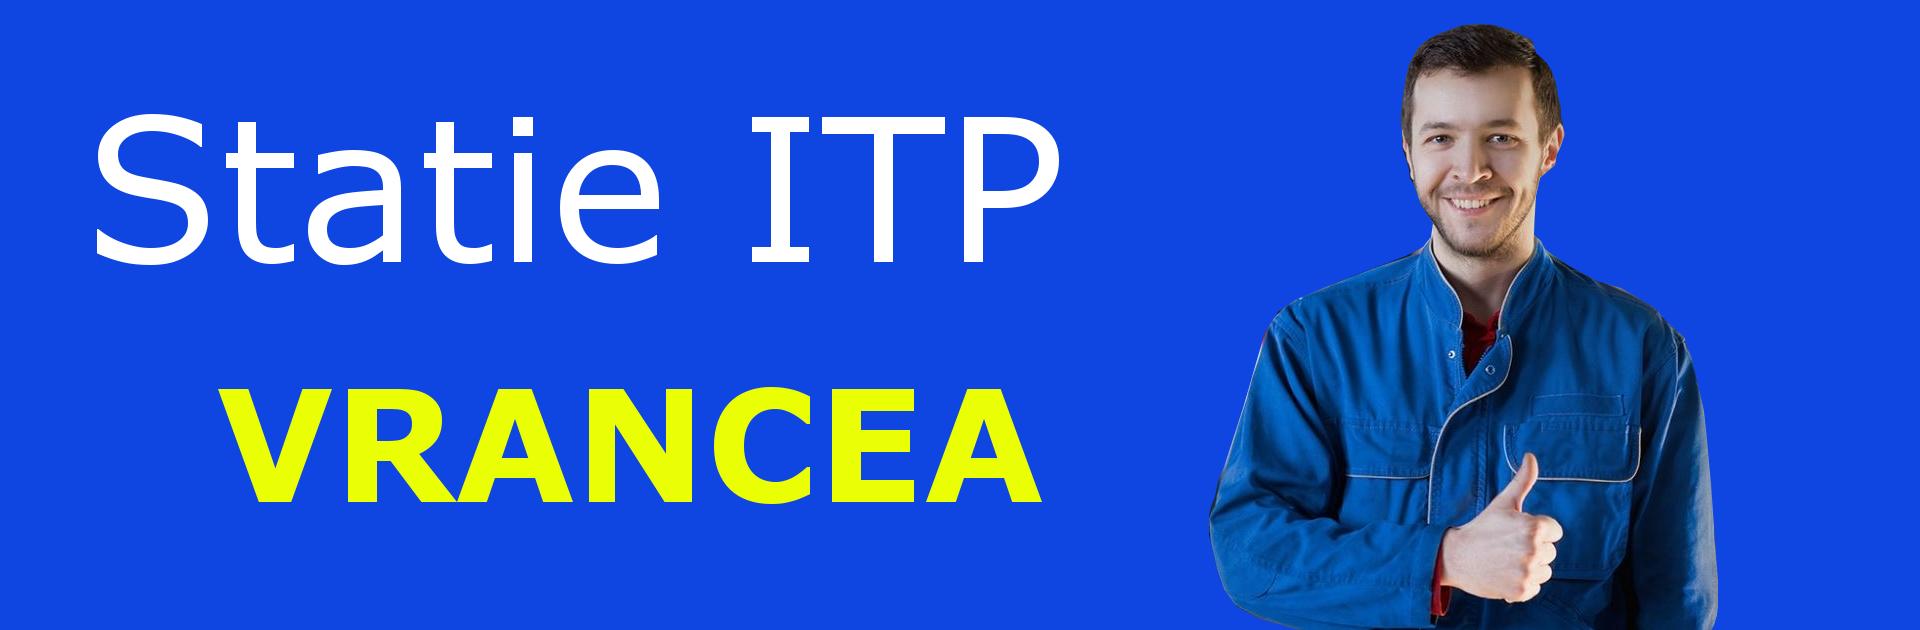 Banner ITP VRANCEA